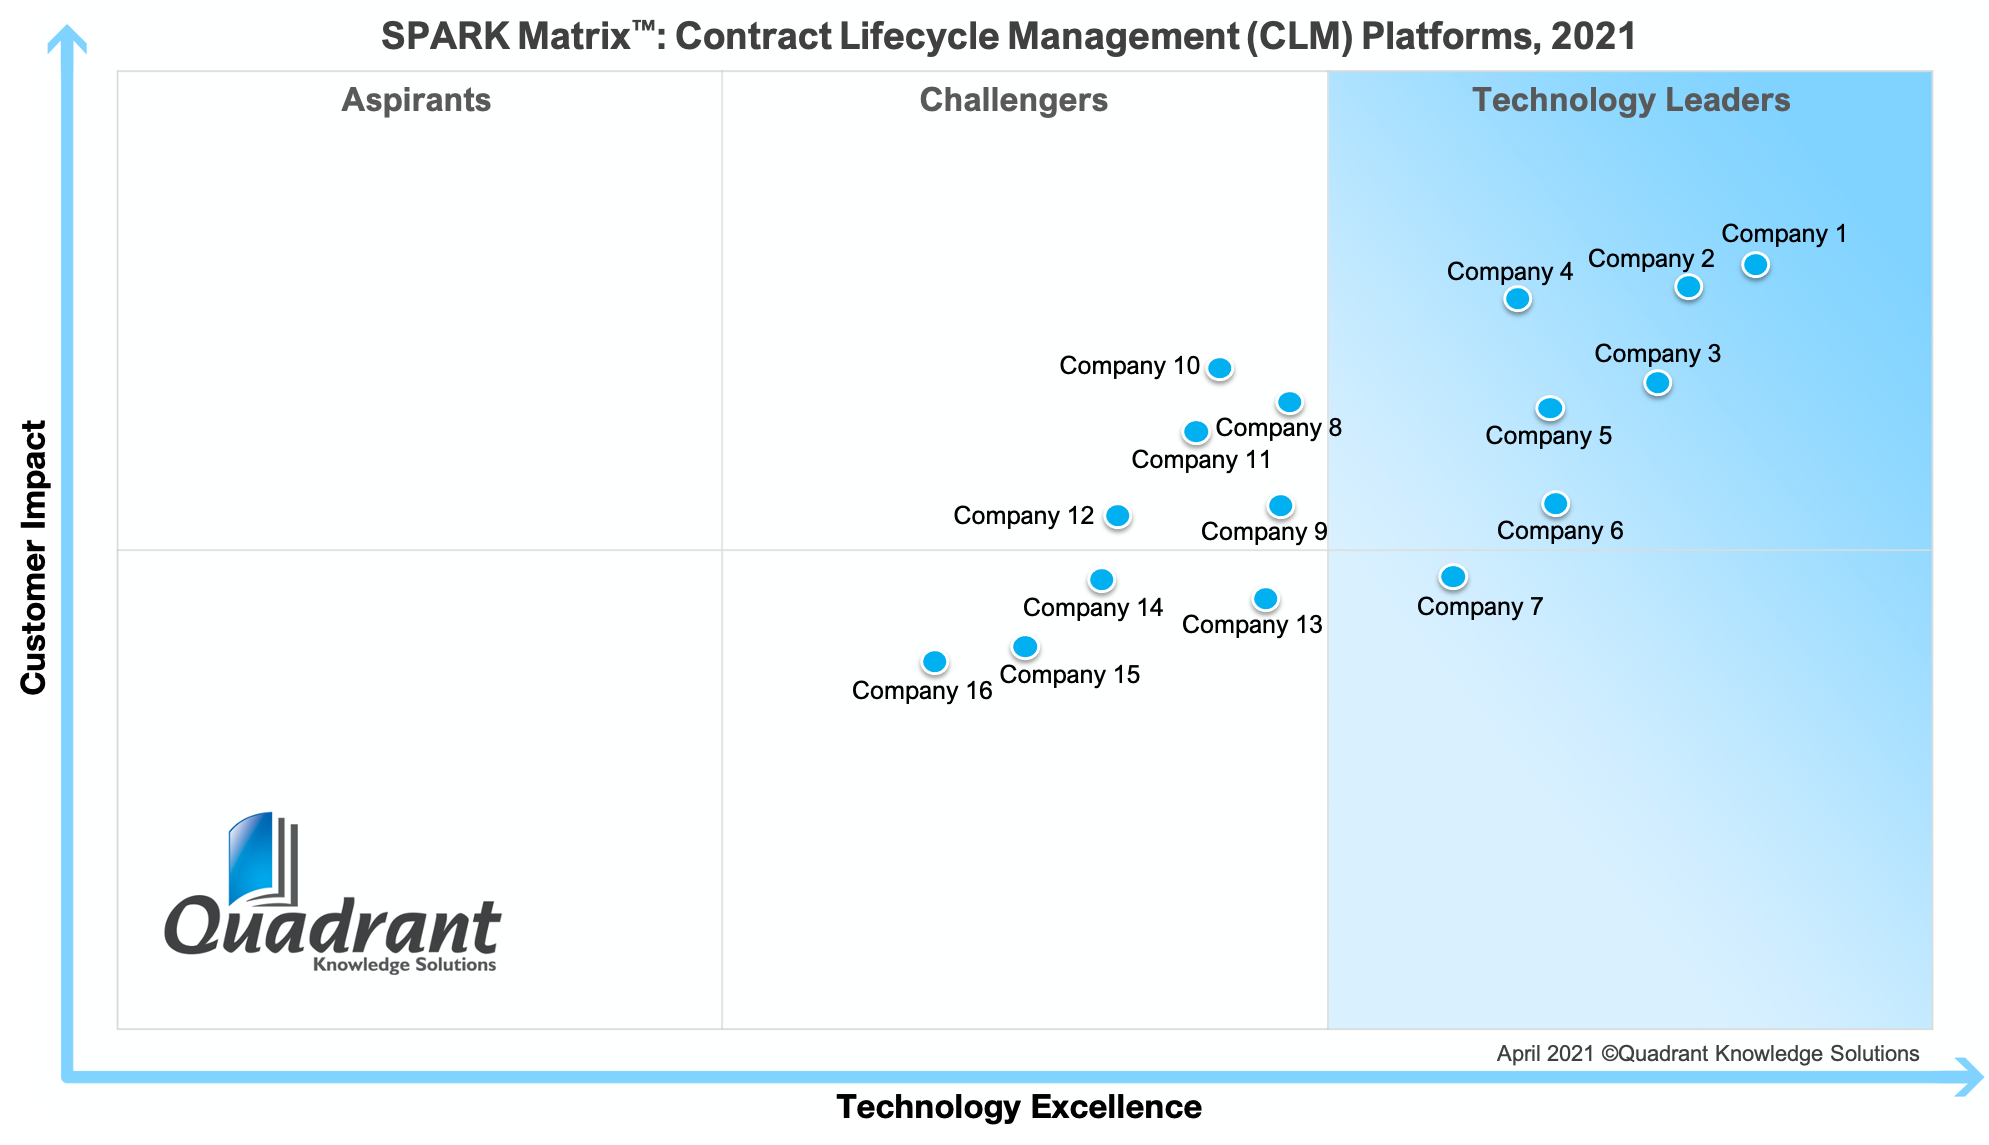 2021 SPARK Matrix Contract Lifecycle Management (CLM) Quadrant Knowledge Solutions